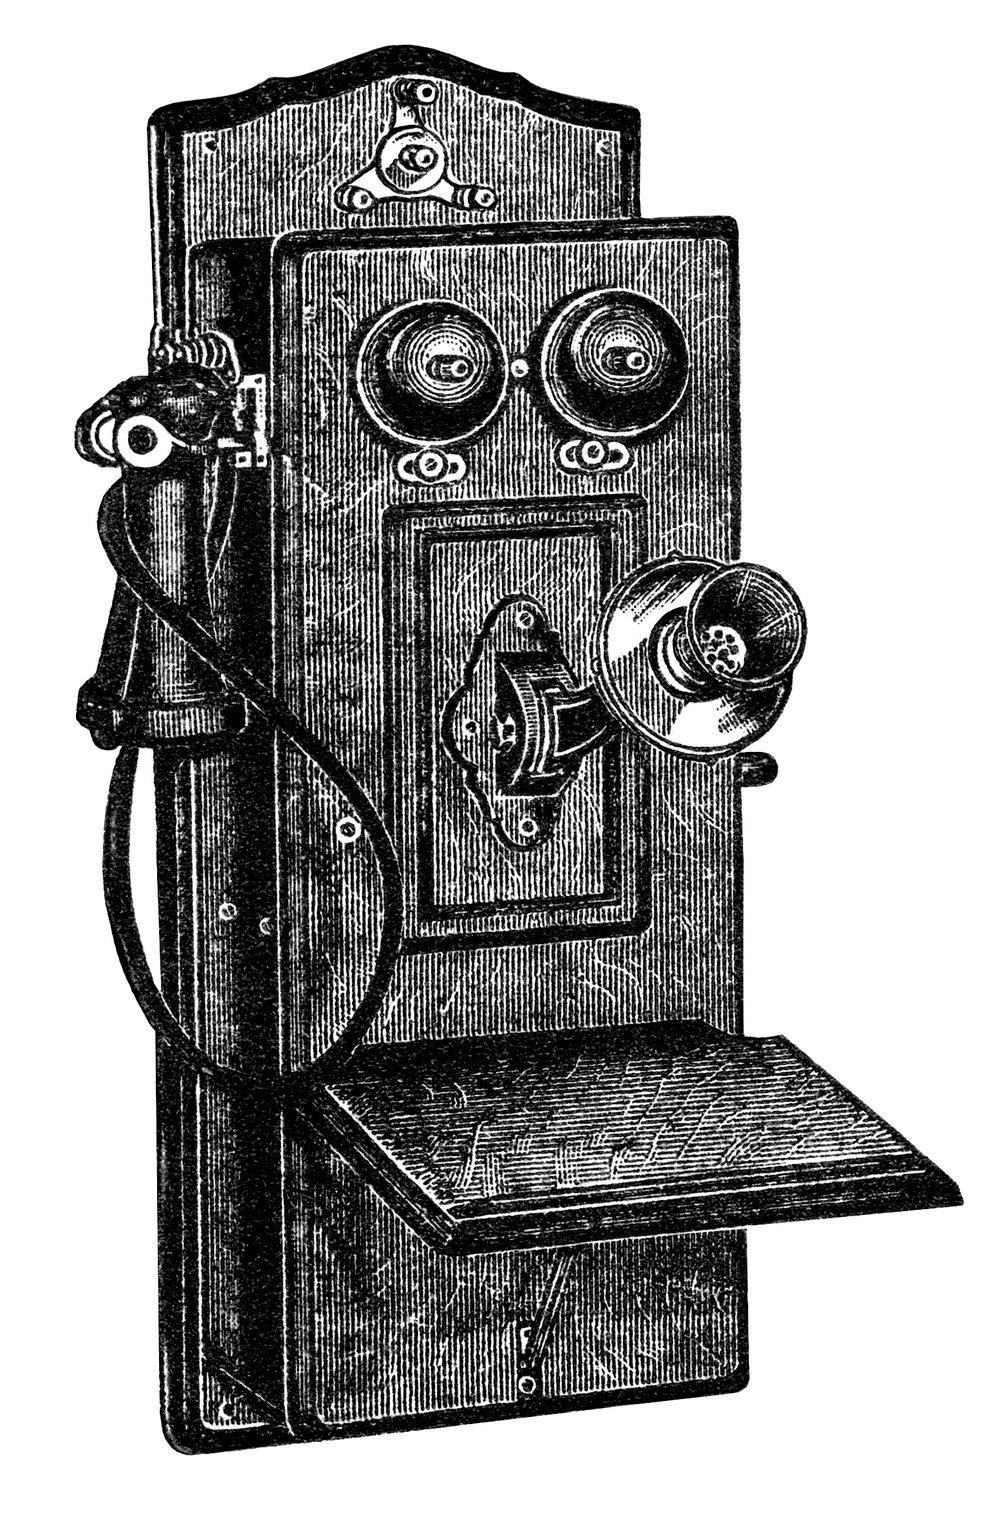 OldDesignShop_Telephone1916BW.jpg